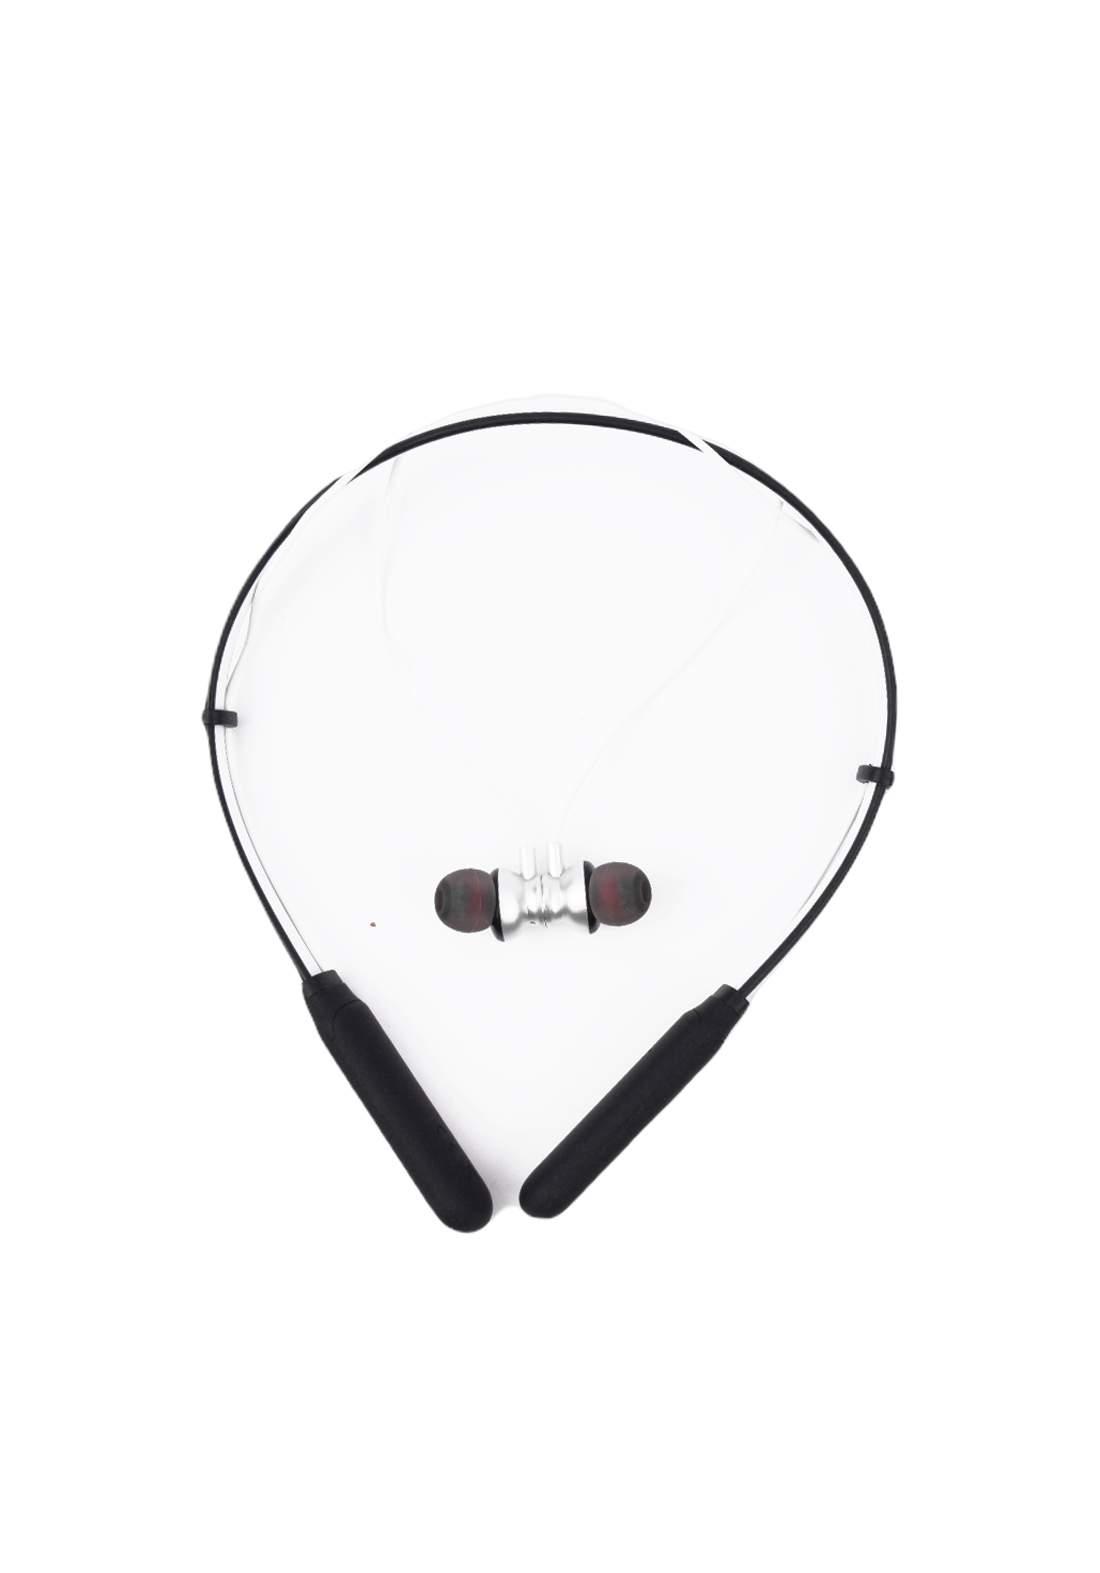 Lenovo HE05 Neckband Bluetooth Headset- Silver سماعة